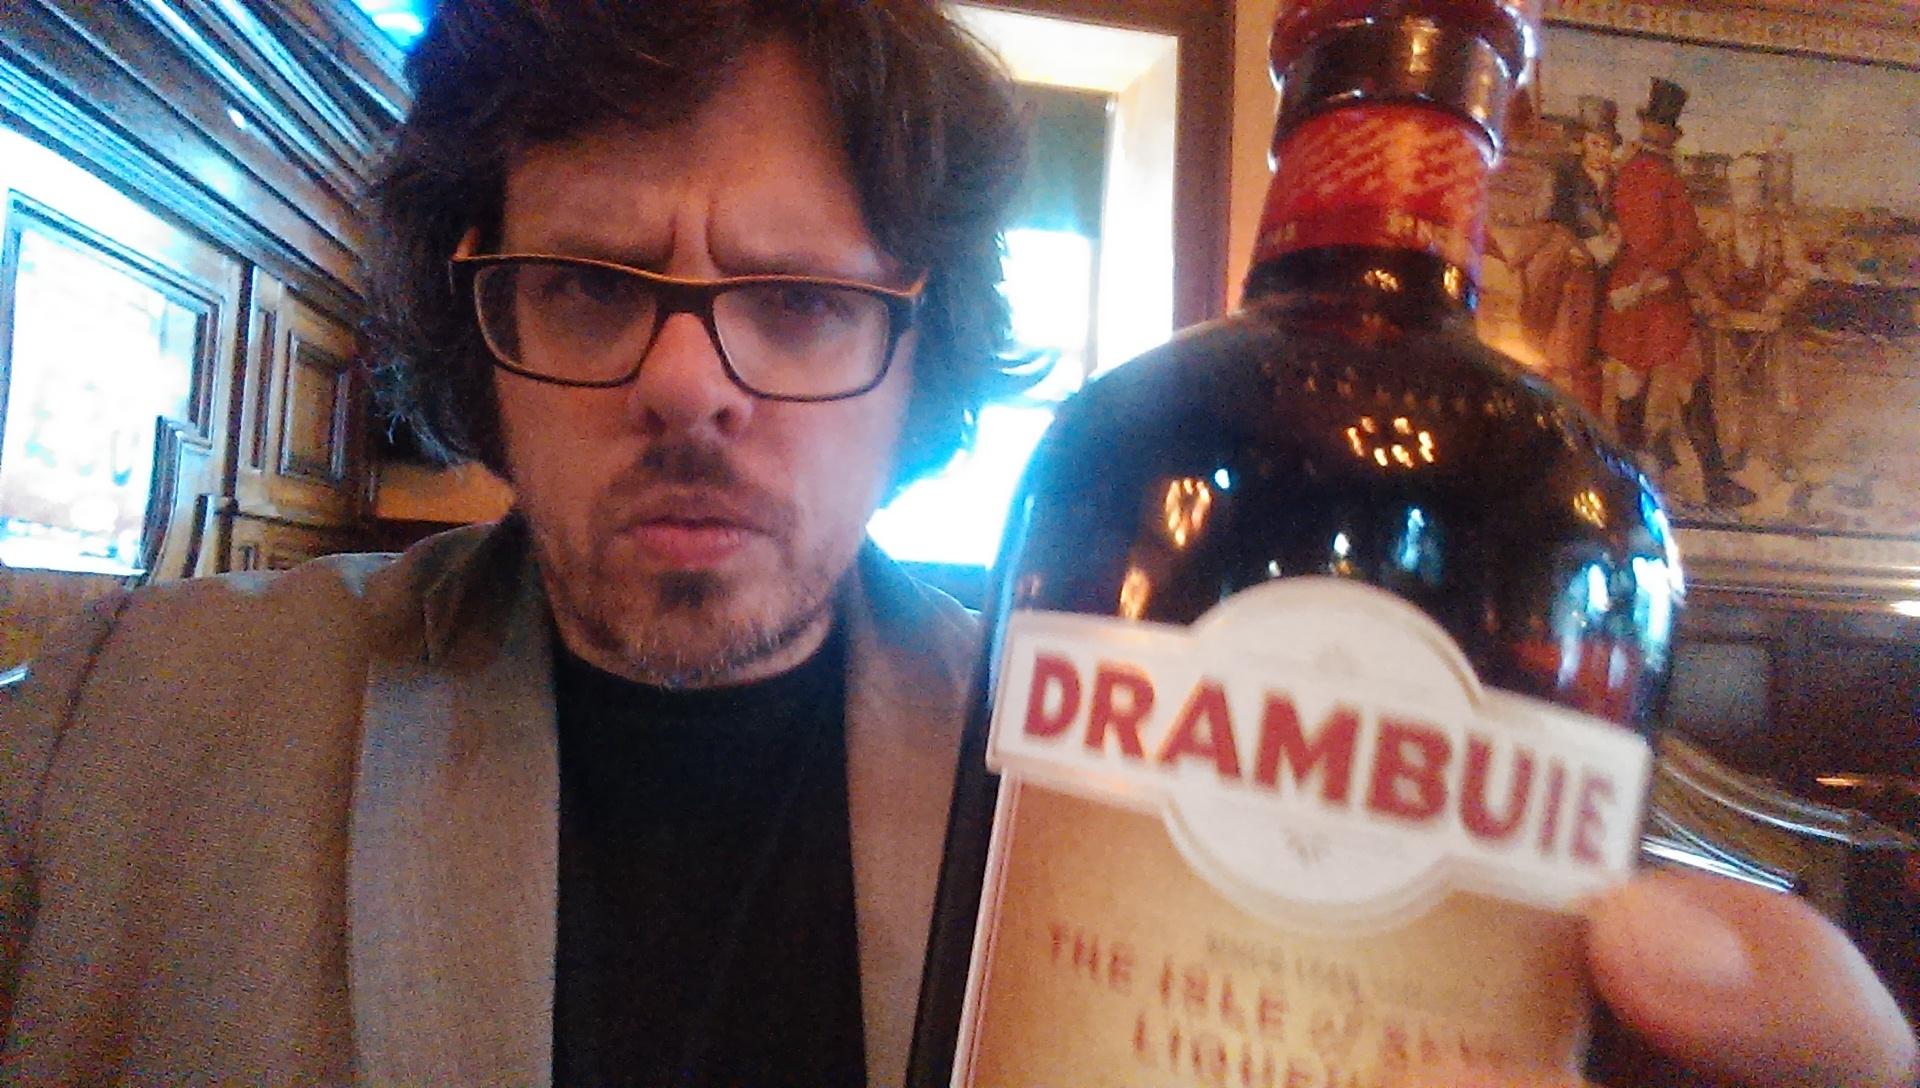 Dr Paul Drambuie